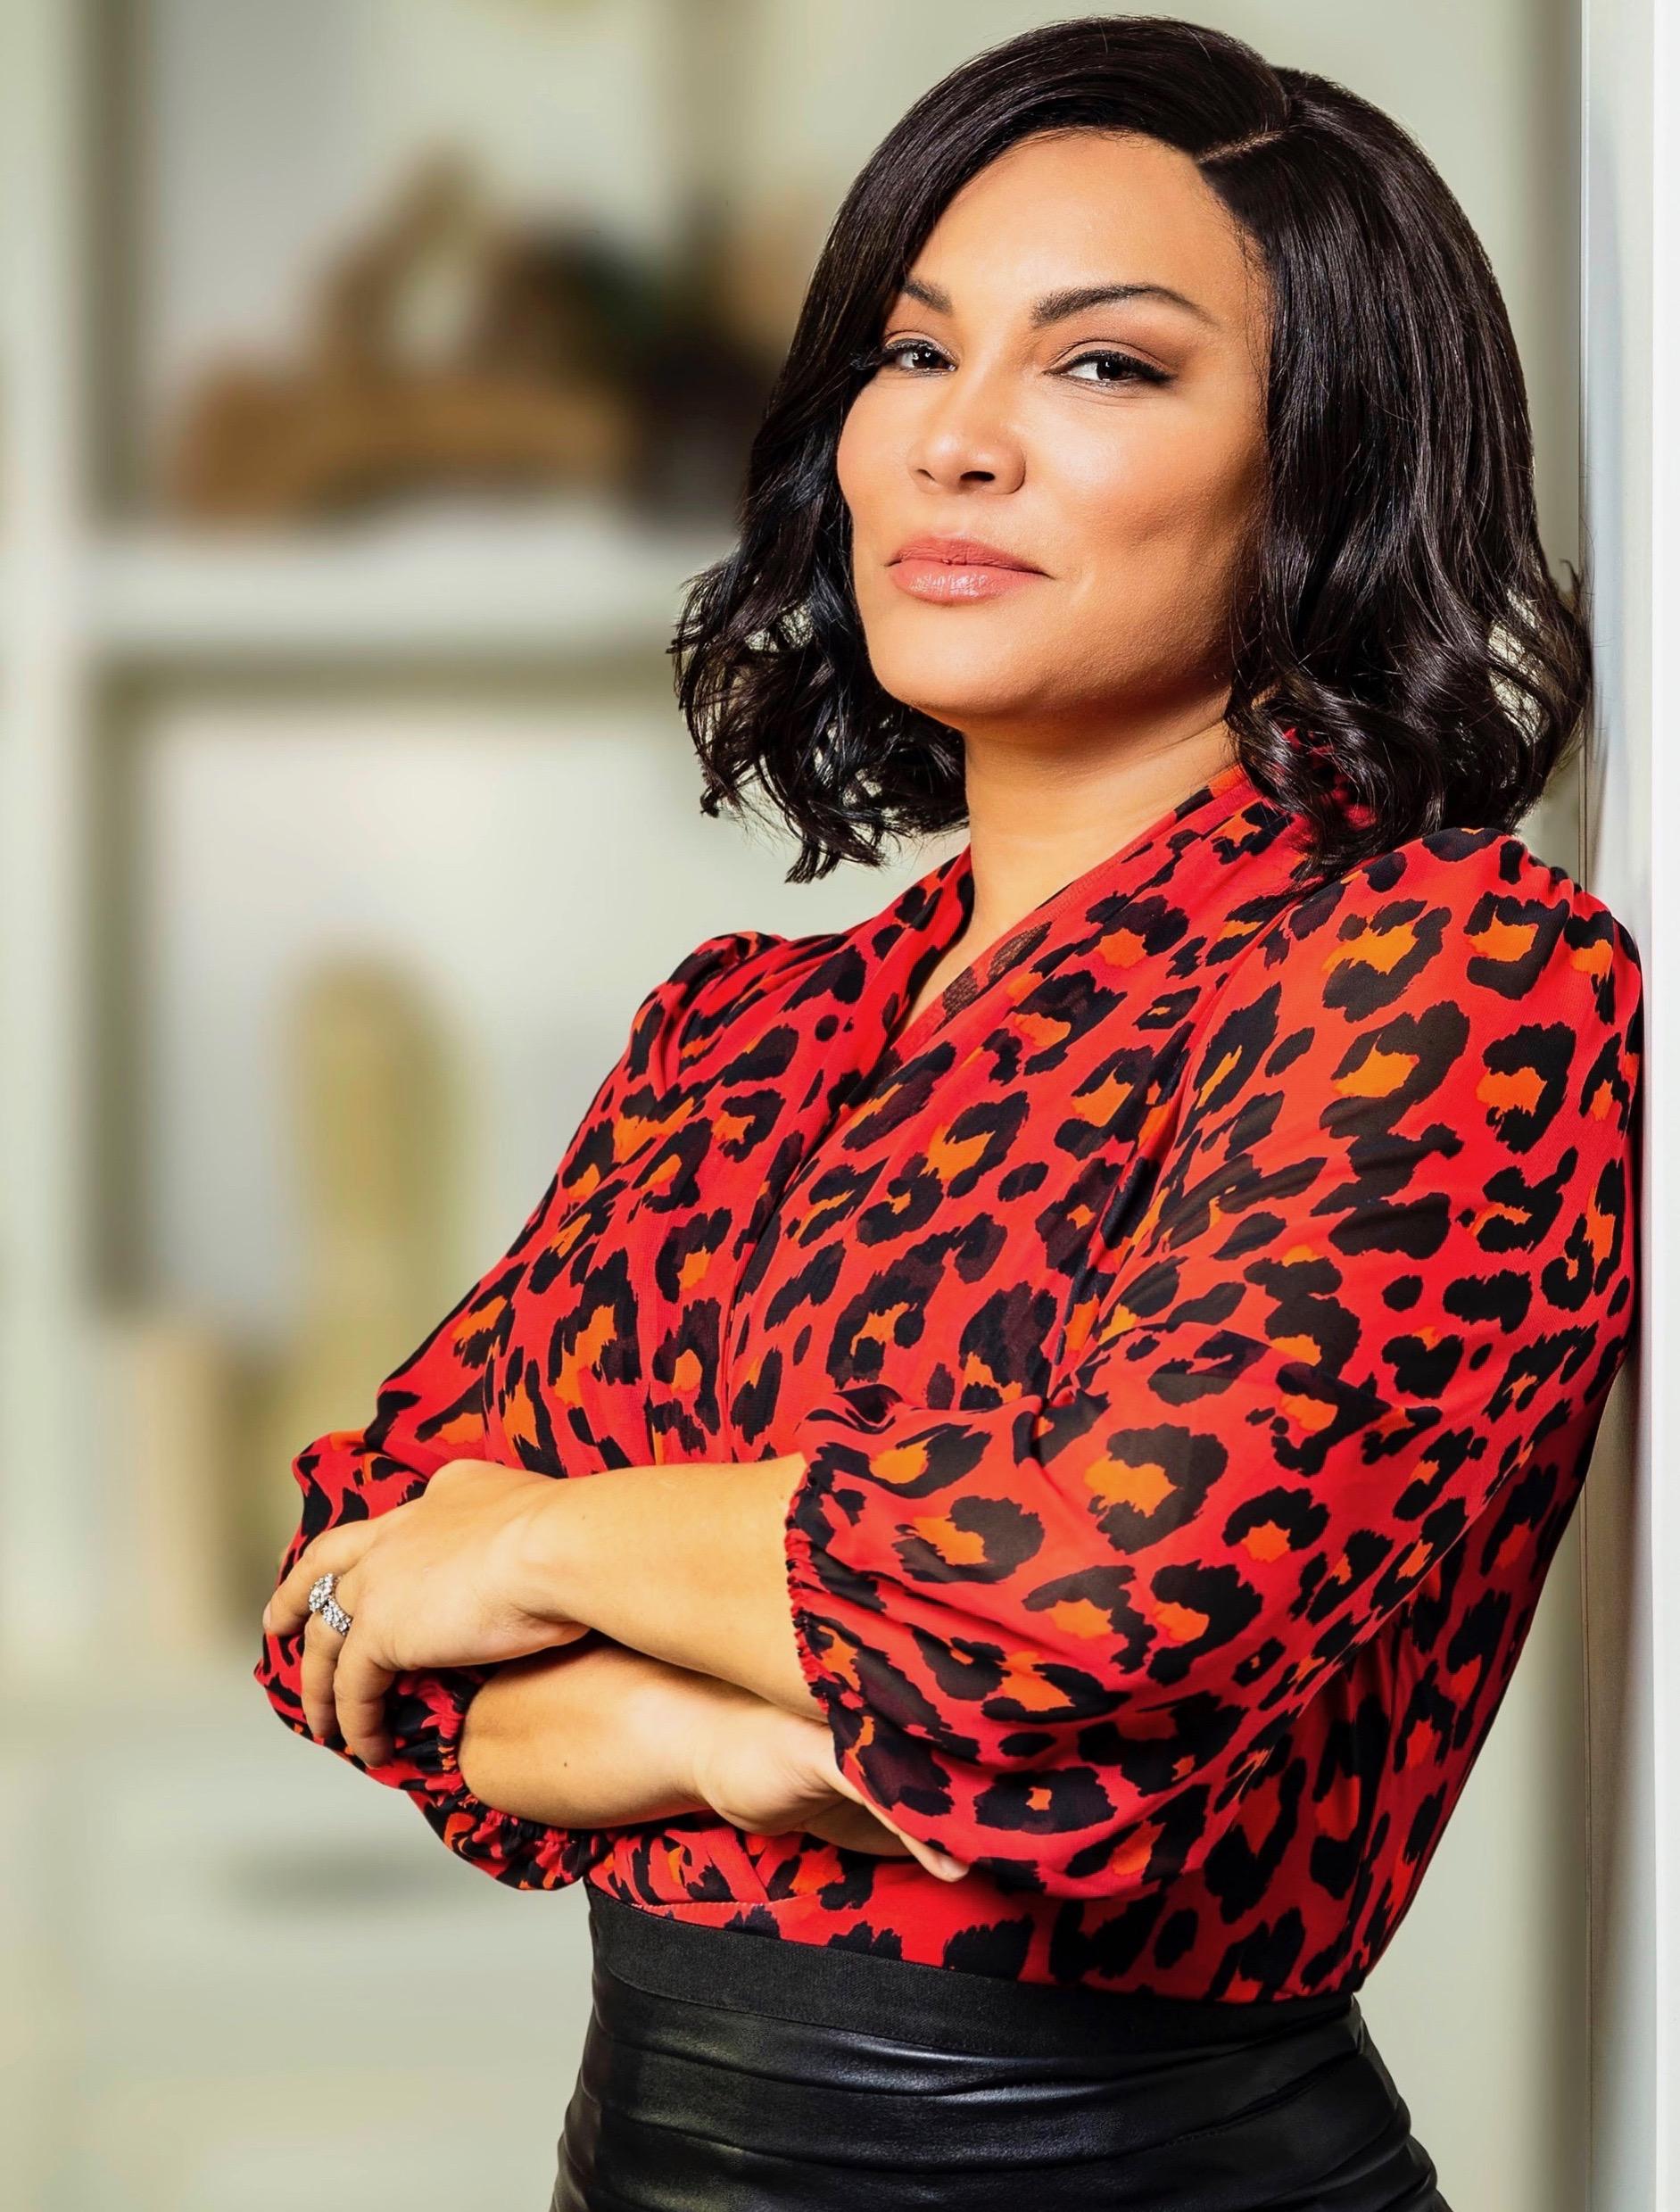 Egypt Sherrod red blouse closeup.JPG